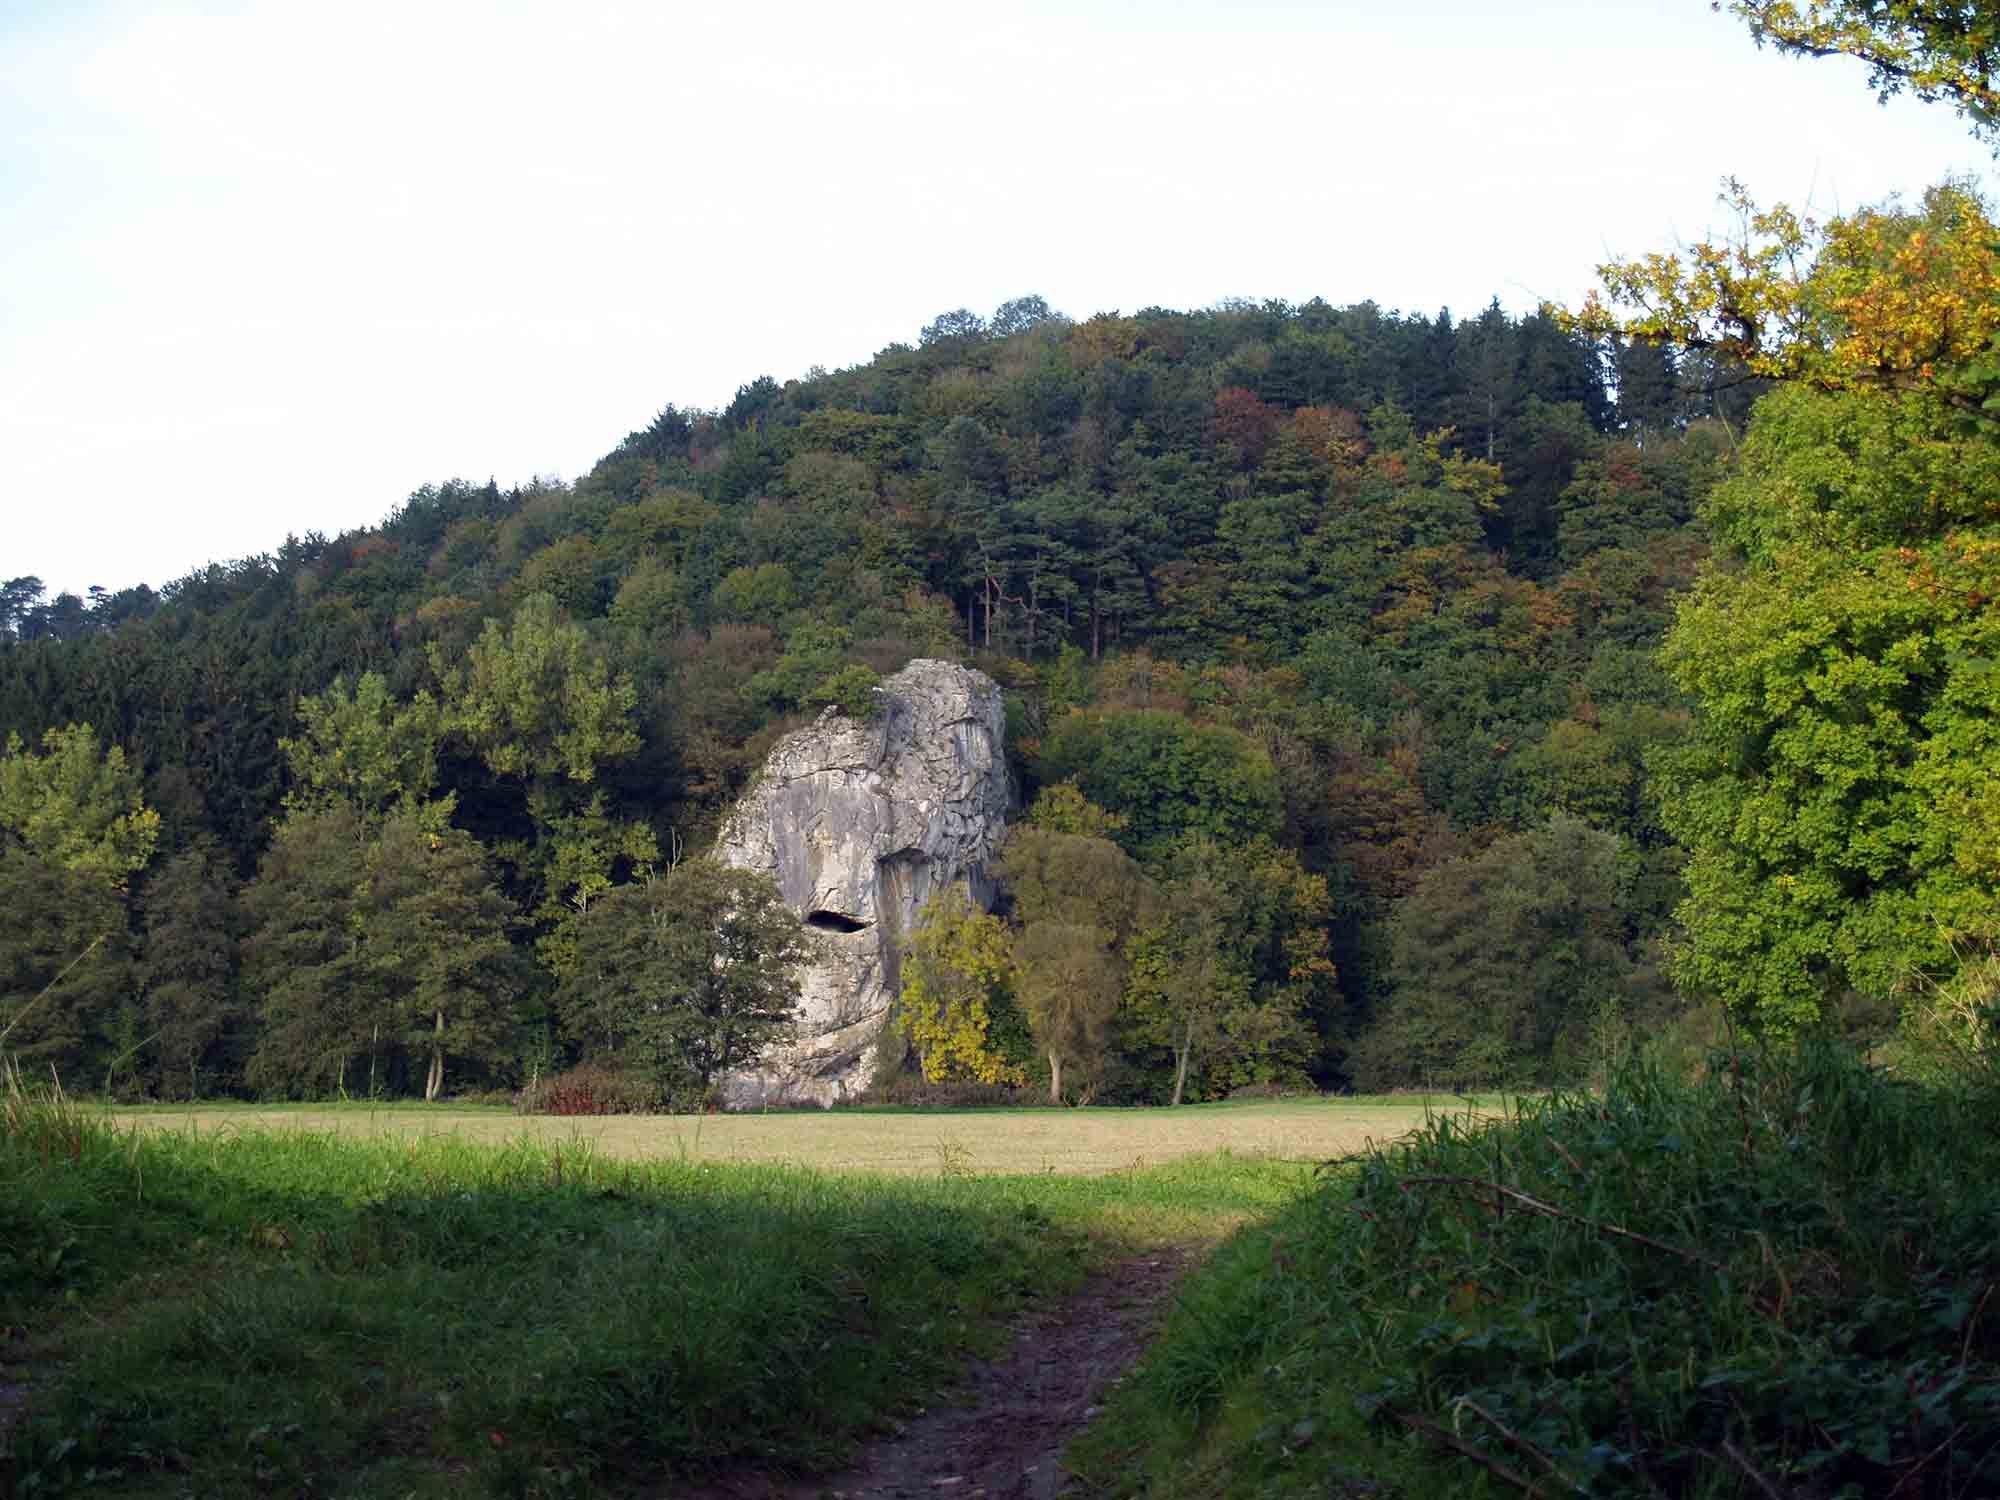 ardenne residences durbuy region landscapes bomal sur ourthe roches aux corneilles